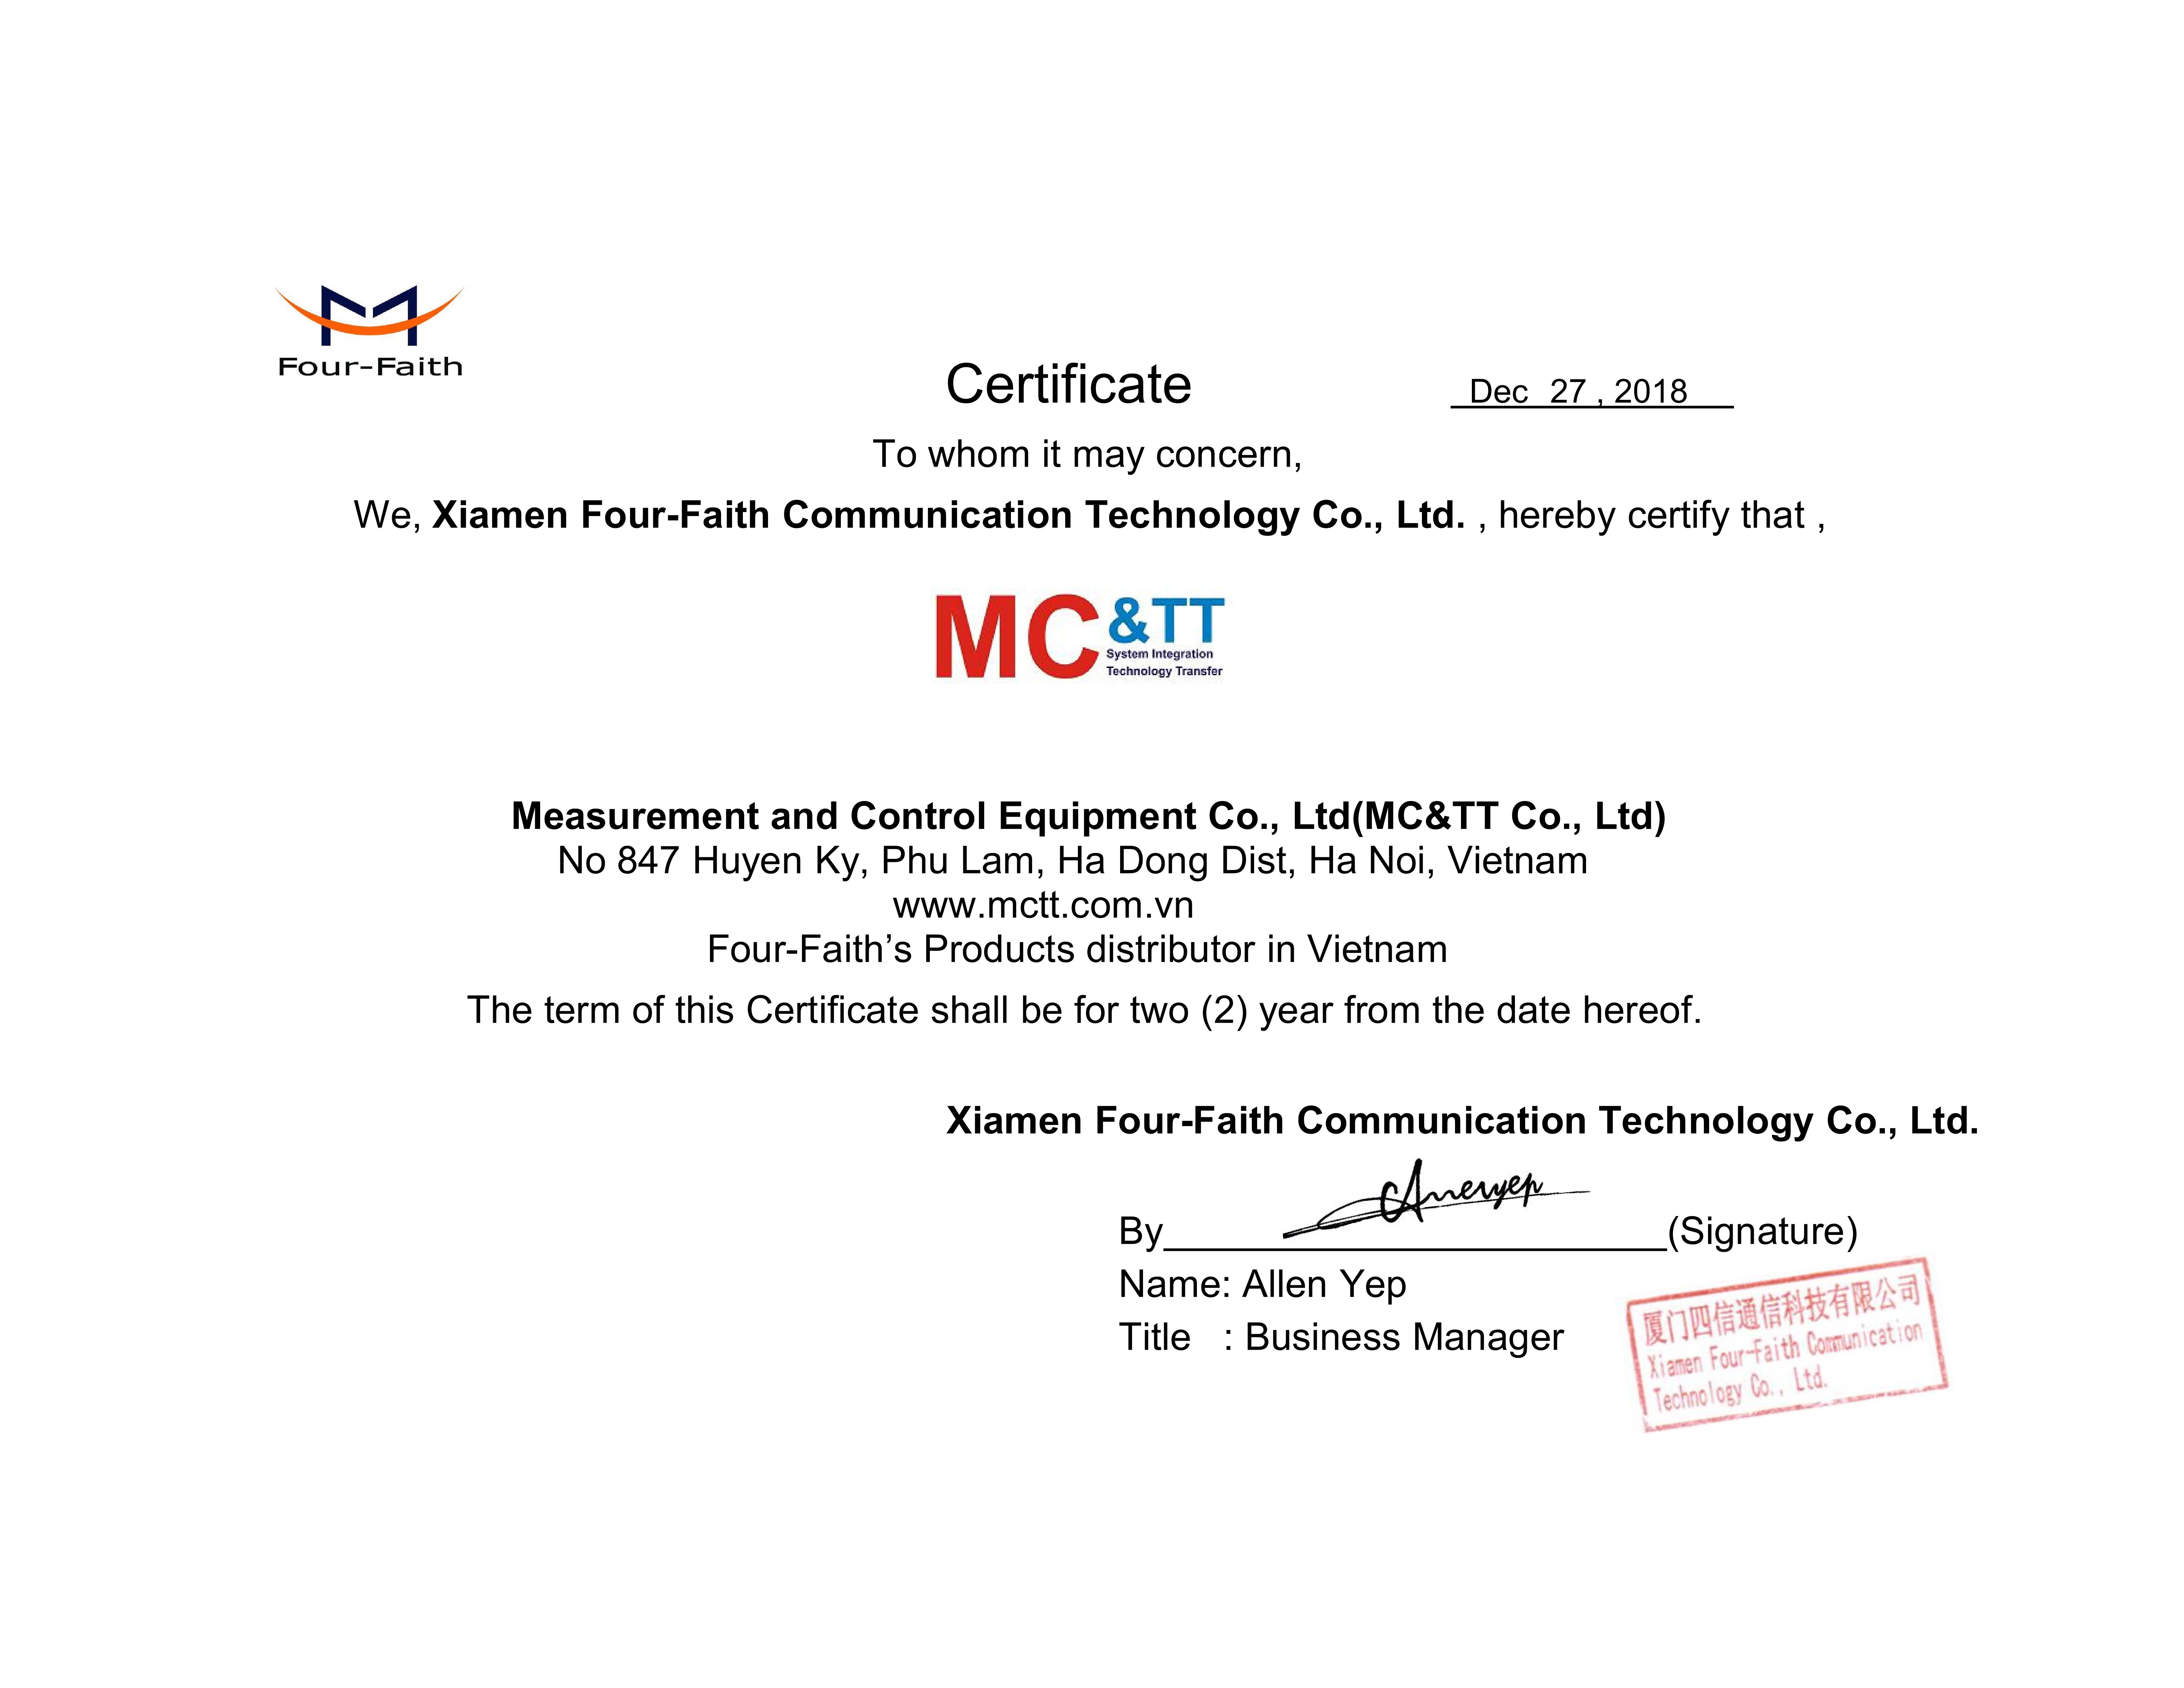 2018 Certificate MC&TT Vietnam_001